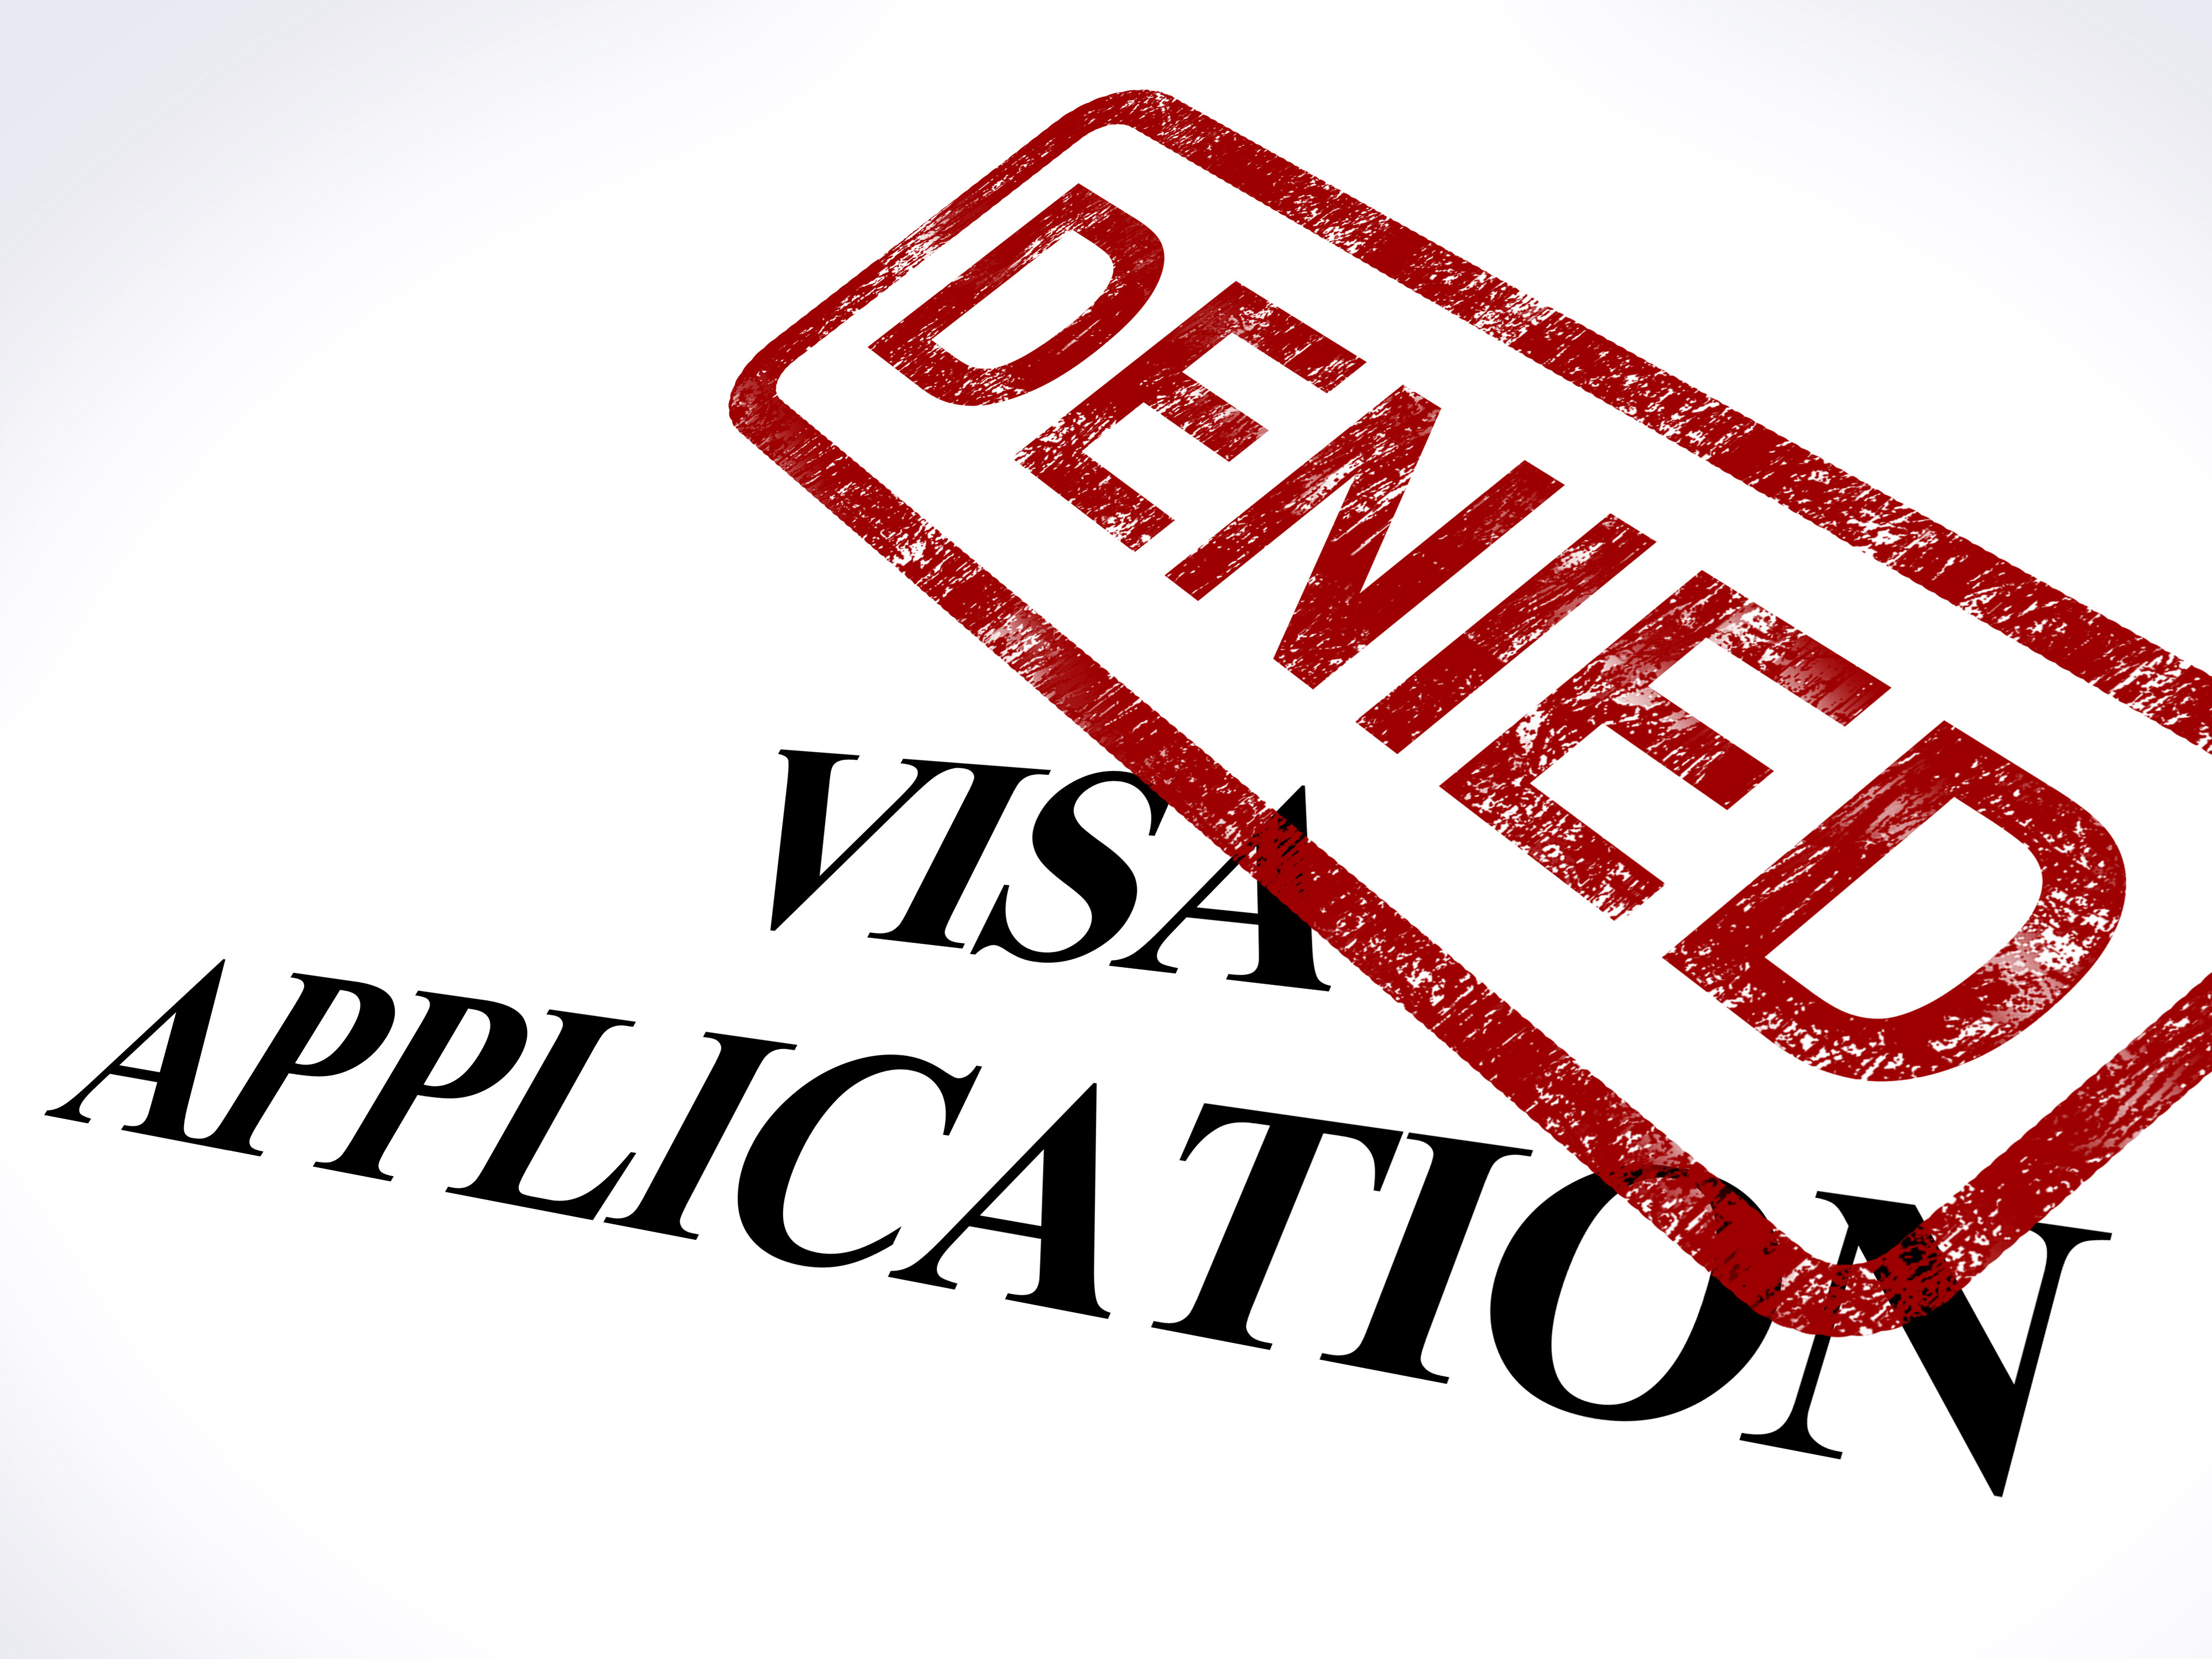 Visa Application Denied Stamp Shows Entry Admission Refused